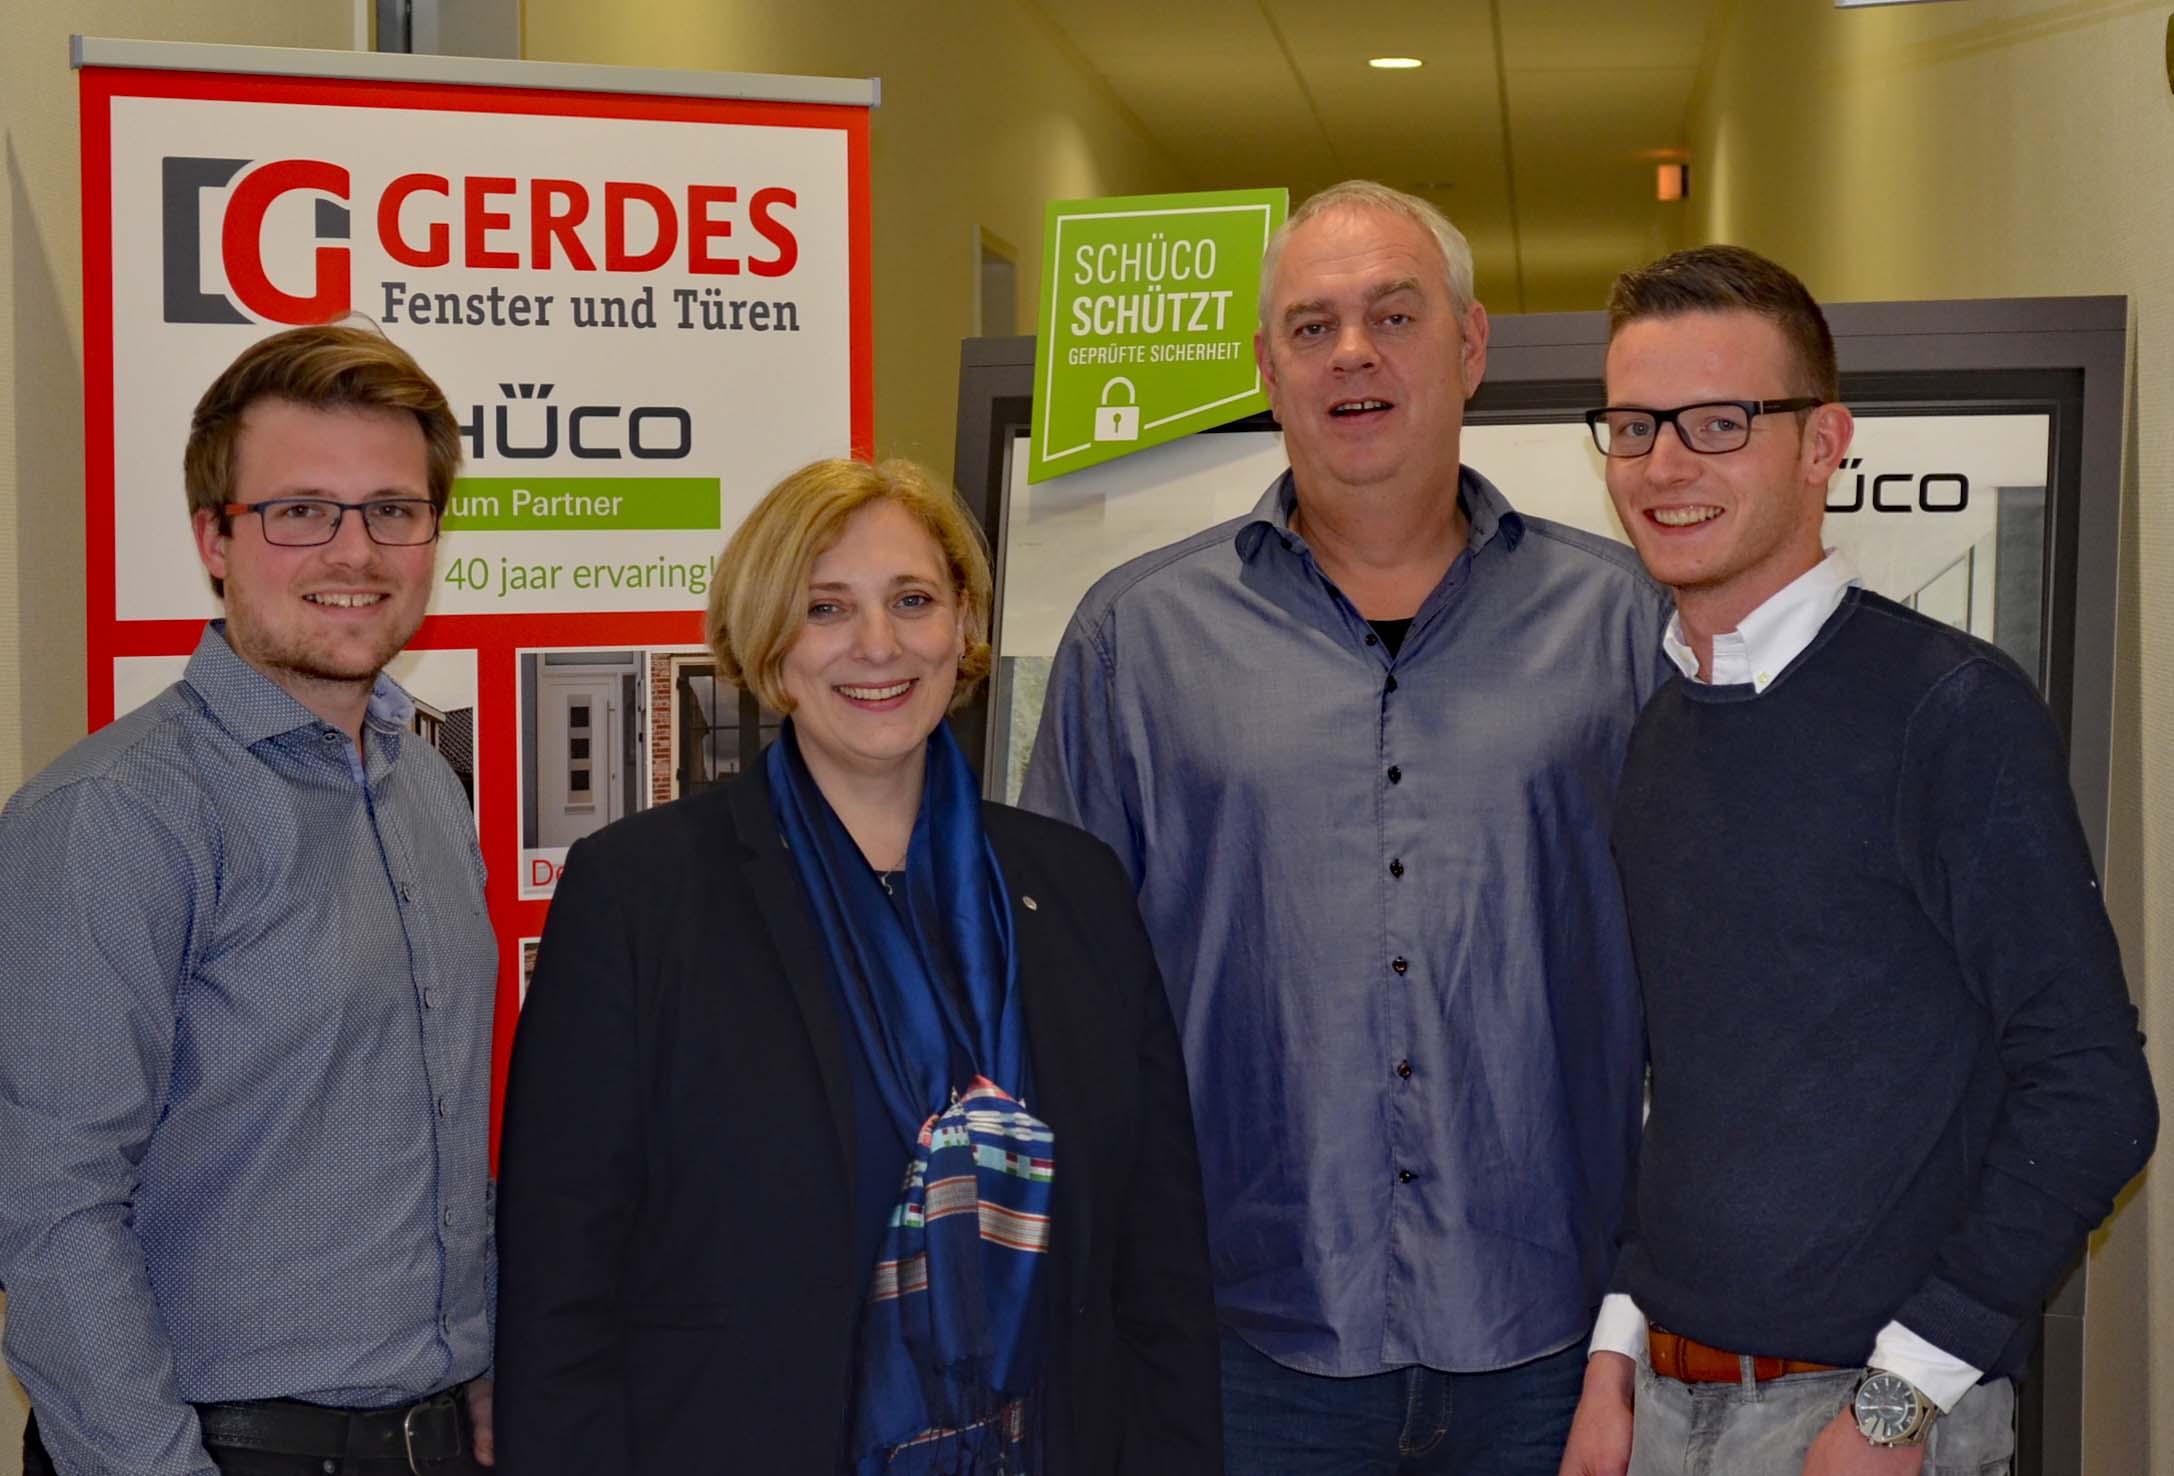 V.l.n.r.: Peter Simon, Dr. Daniela De Ridder, Thomas Gerdes und Julius Frilling